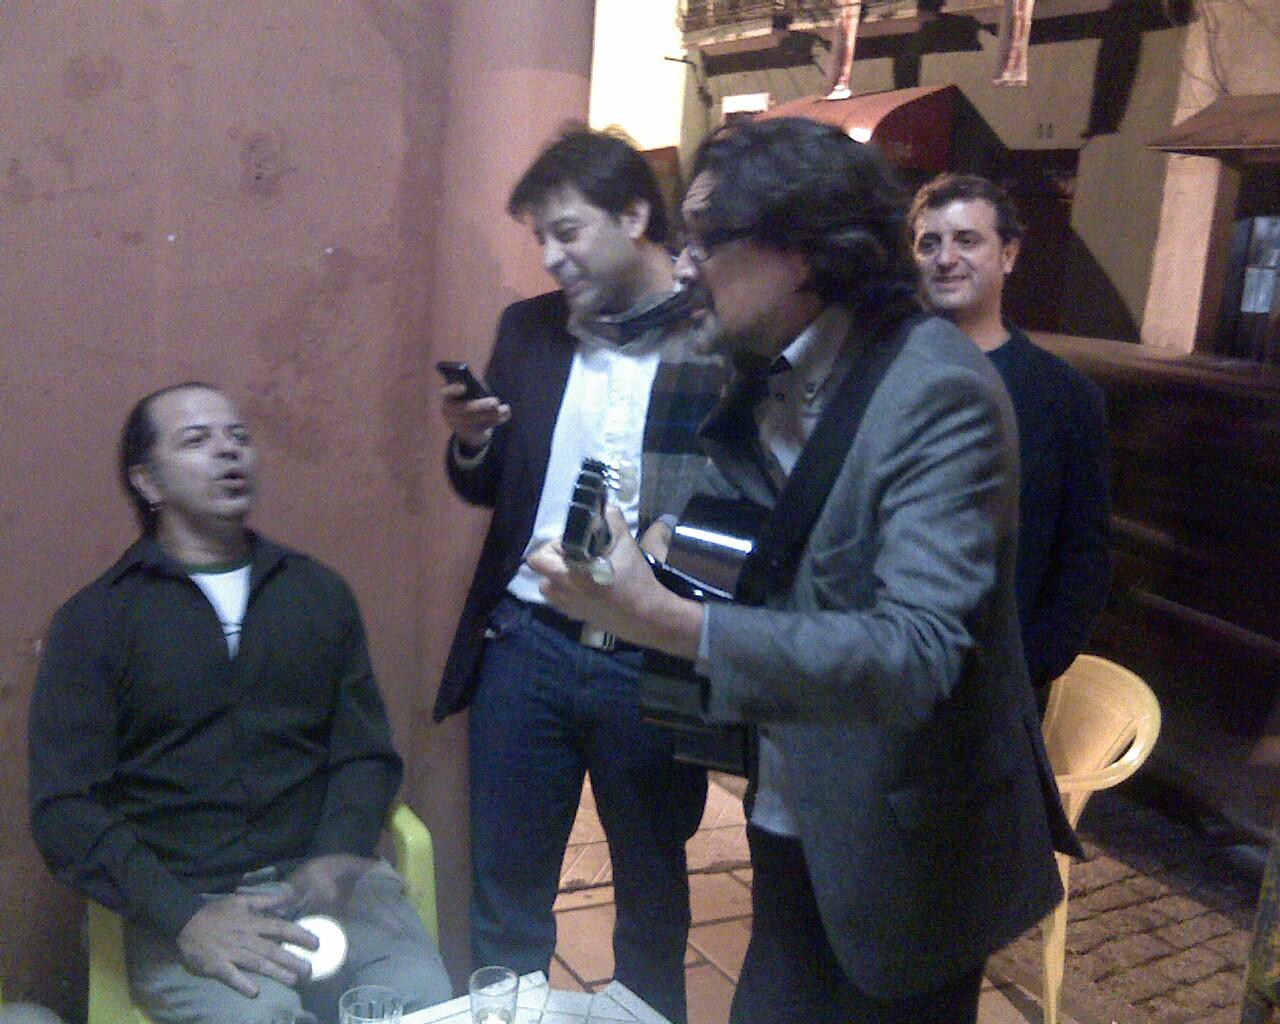 Secretario @vitorortiz debatendo #musica com produtores em #floripa